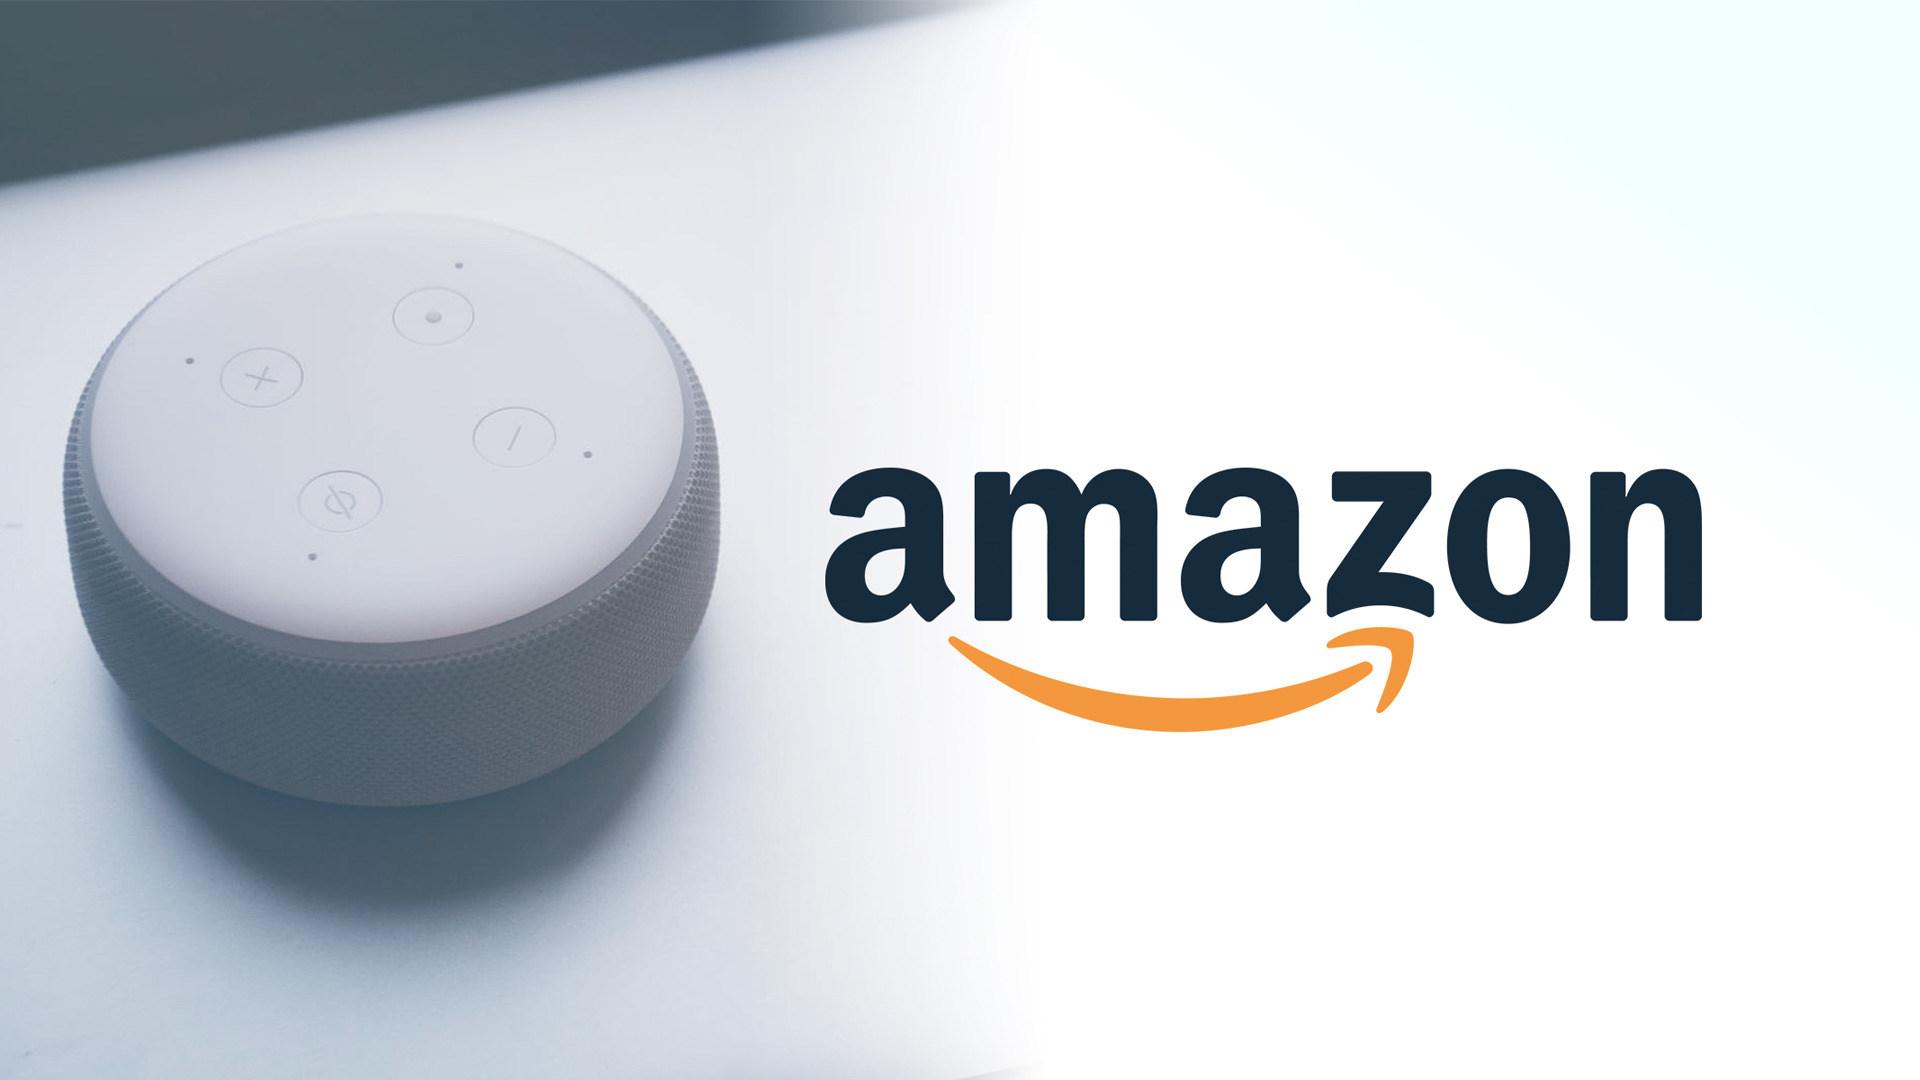 Amazon, Sprachassistent, Lautsprecher, Spracherkennung, Alexa, Amazon Echo, Echo, Amazon Logo, Echo Dot, Amazon Echo Dot